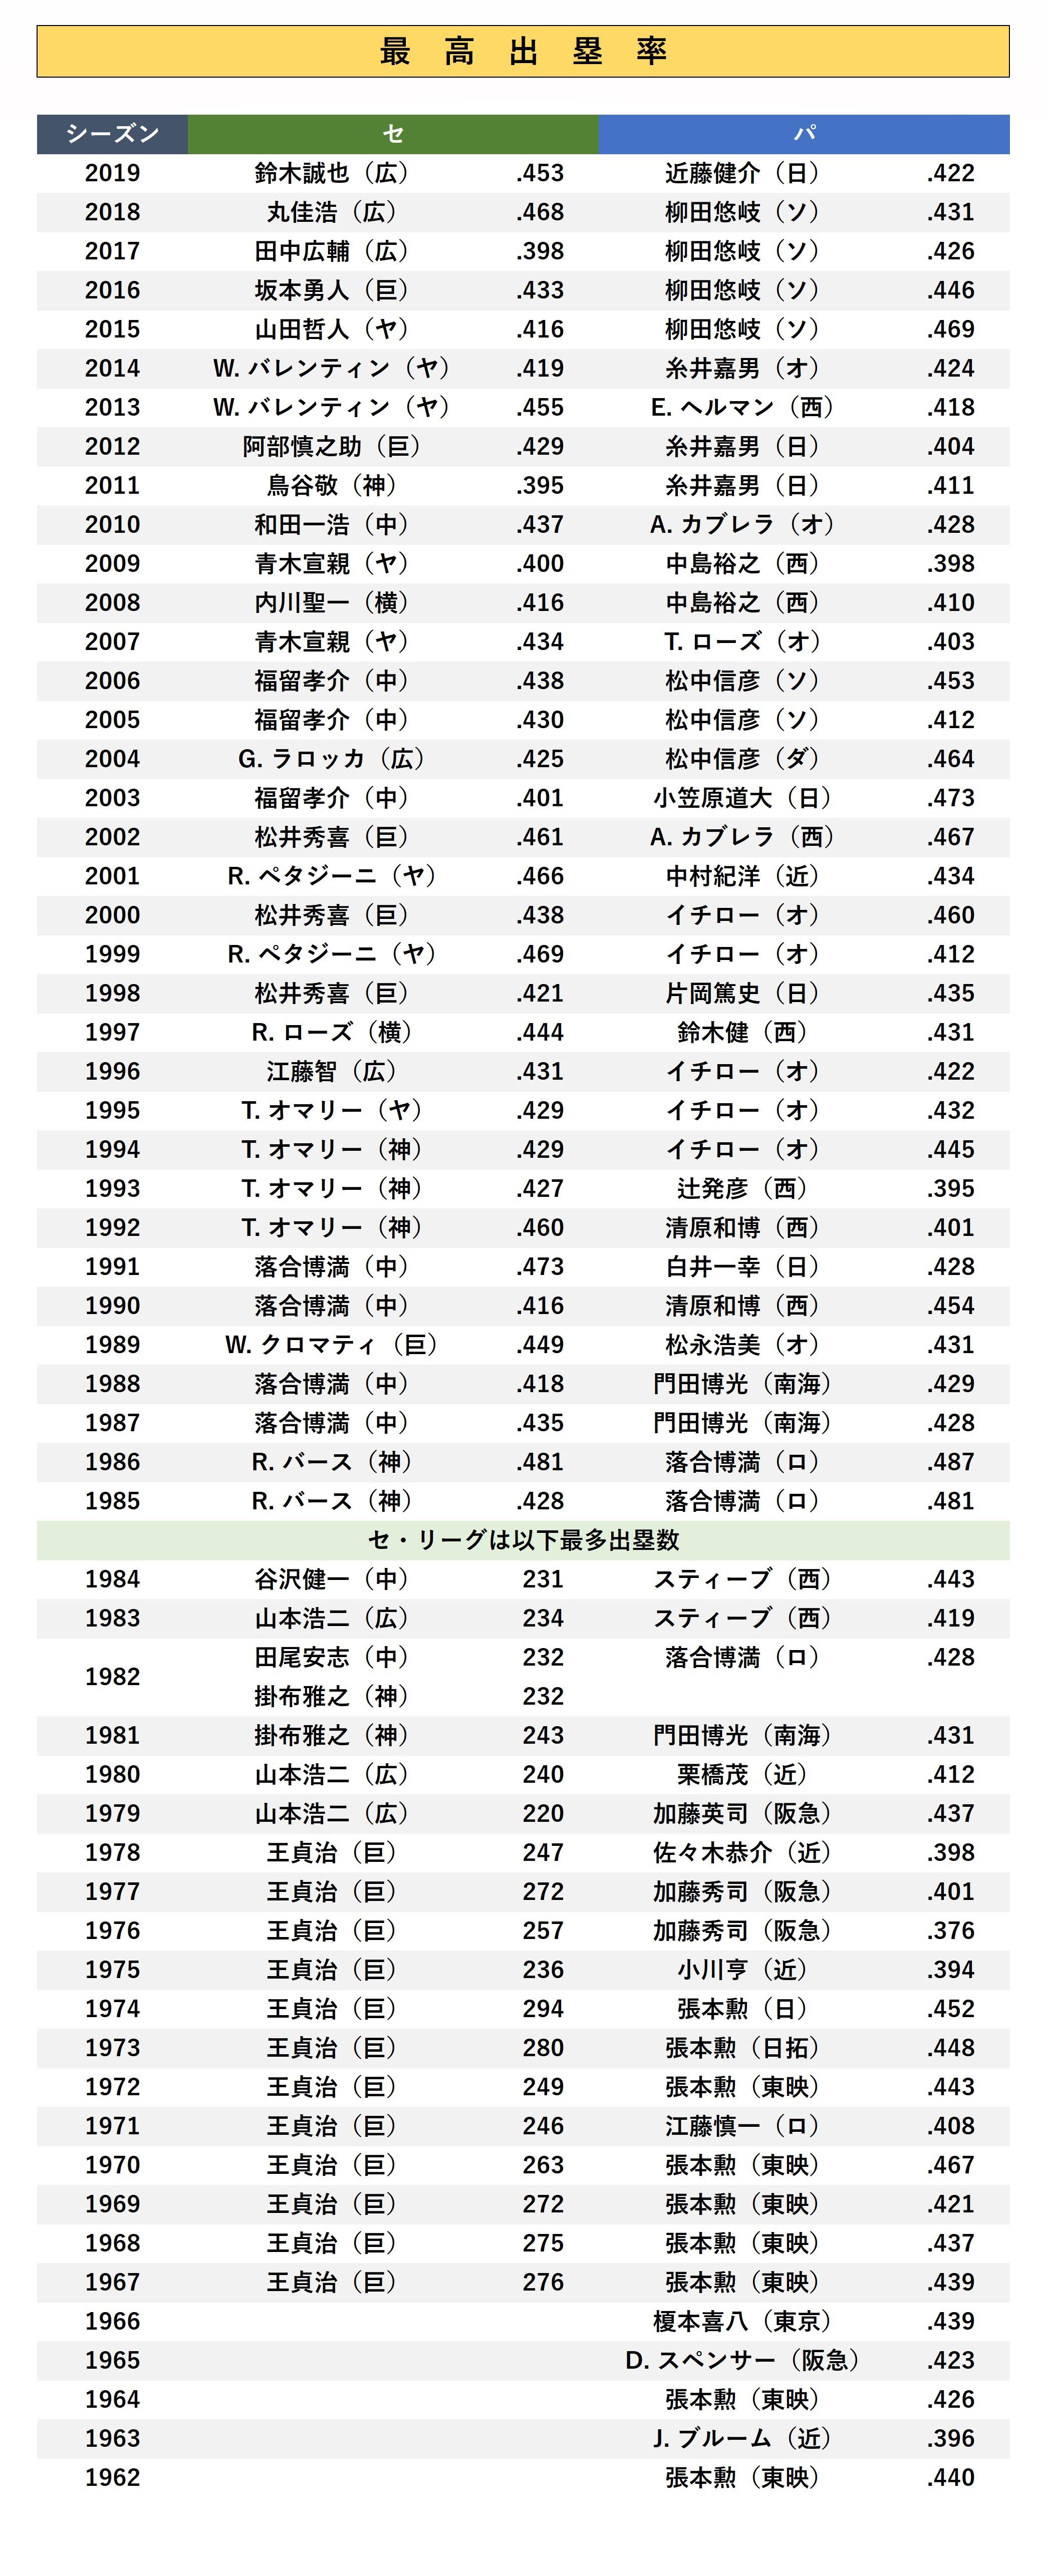 最高出塁率(最多出塁数)歴代獲得選手成績<セリーグ・パリーグ ...